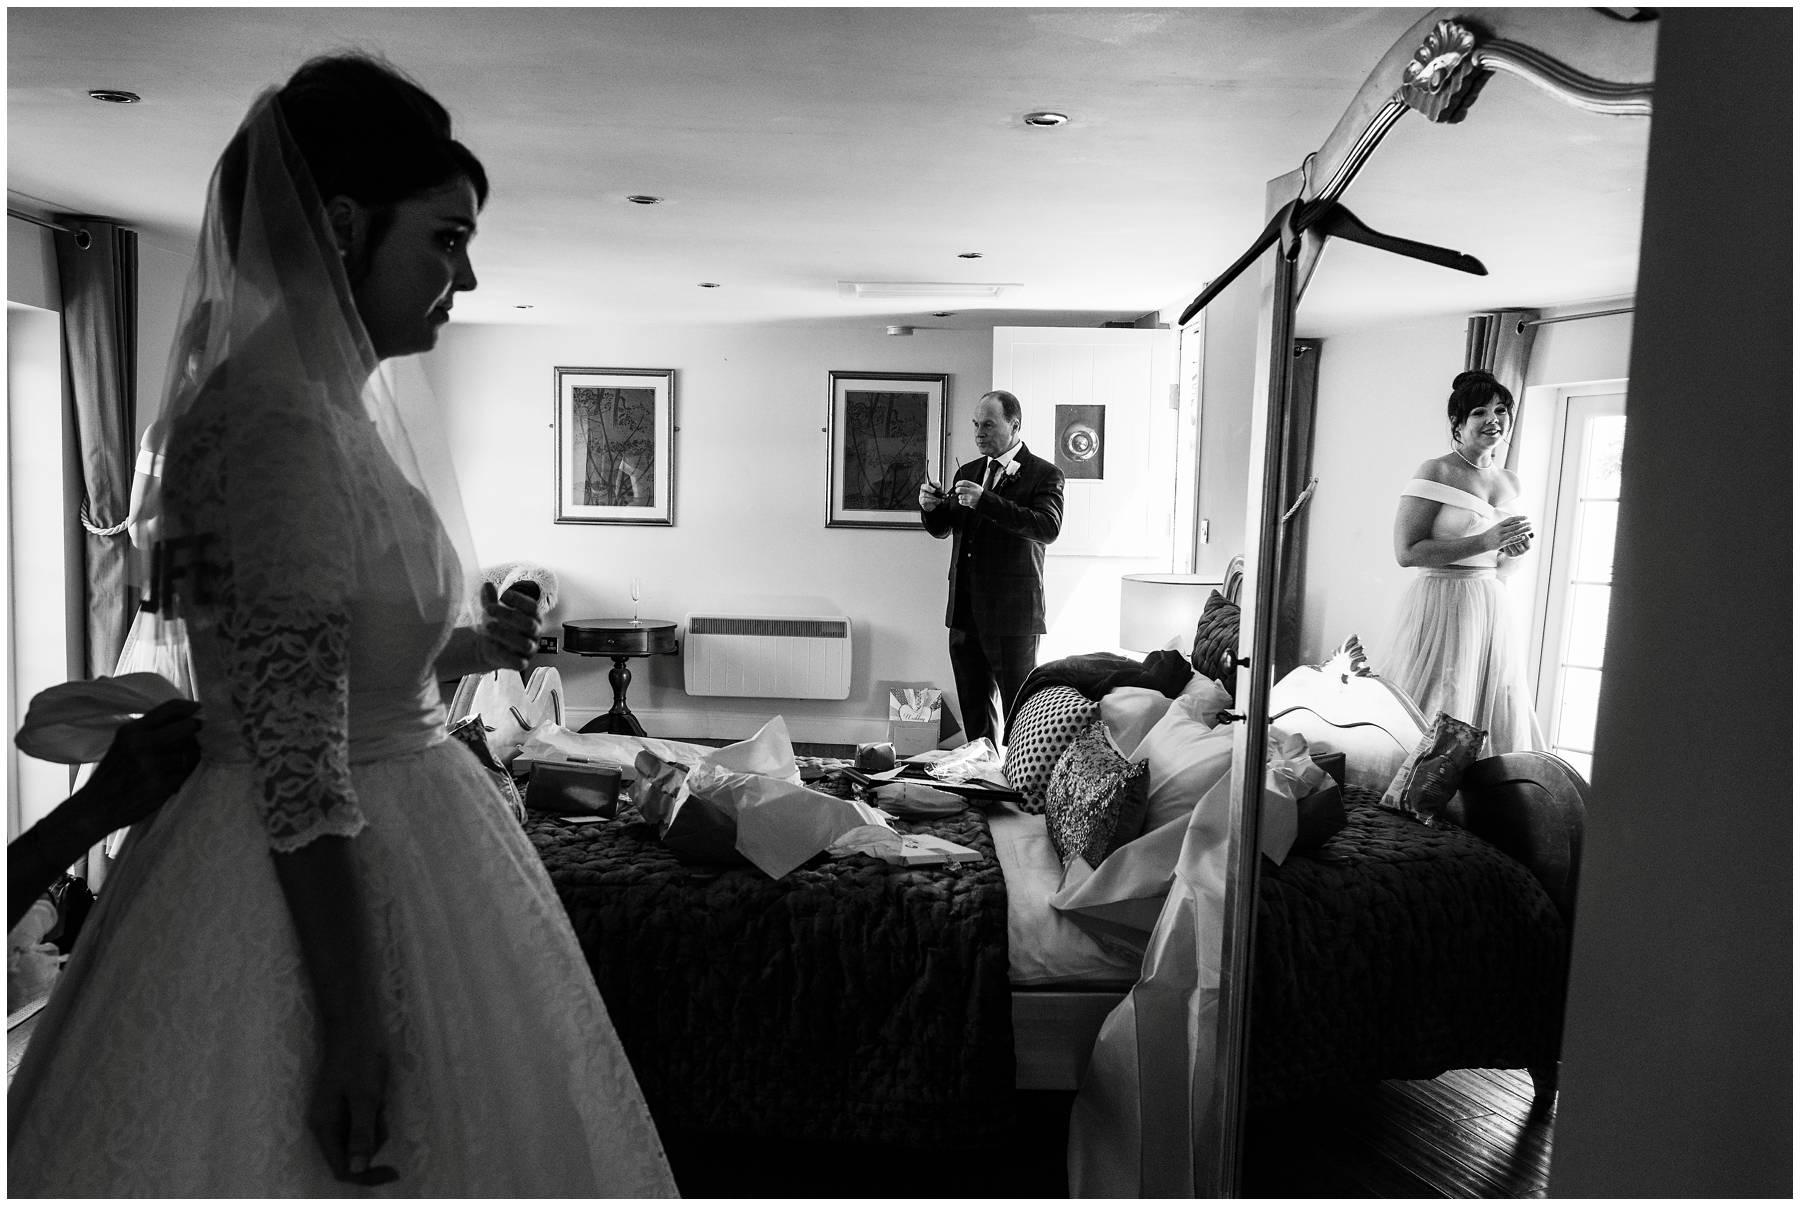 Documentary Wedding Photography at Vaulty Manor